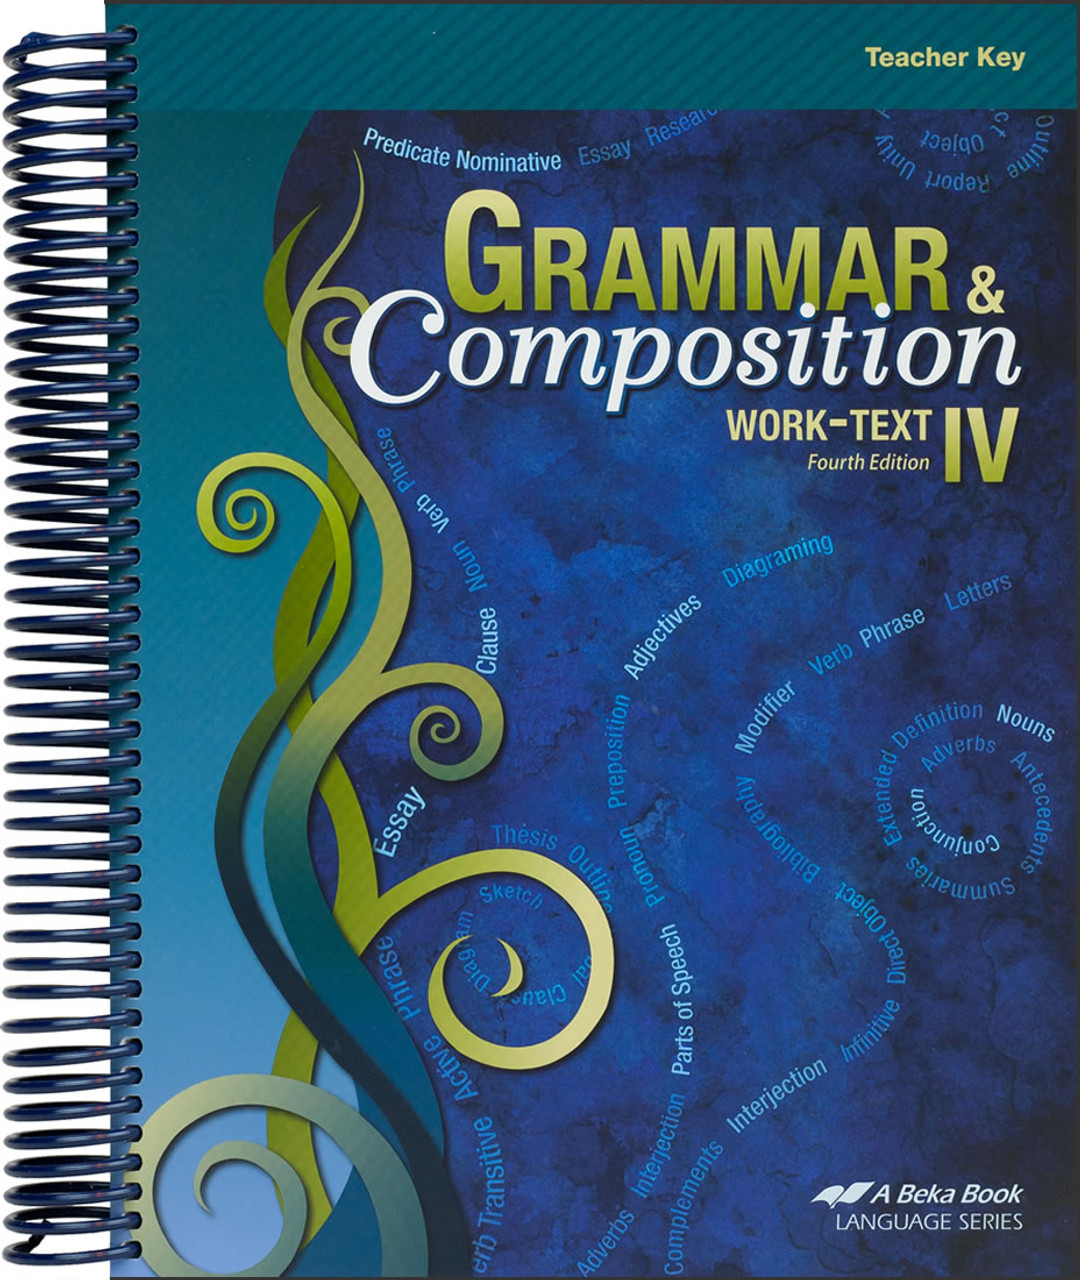 Grammar and Composition IV, 4th edition - Teacher Key